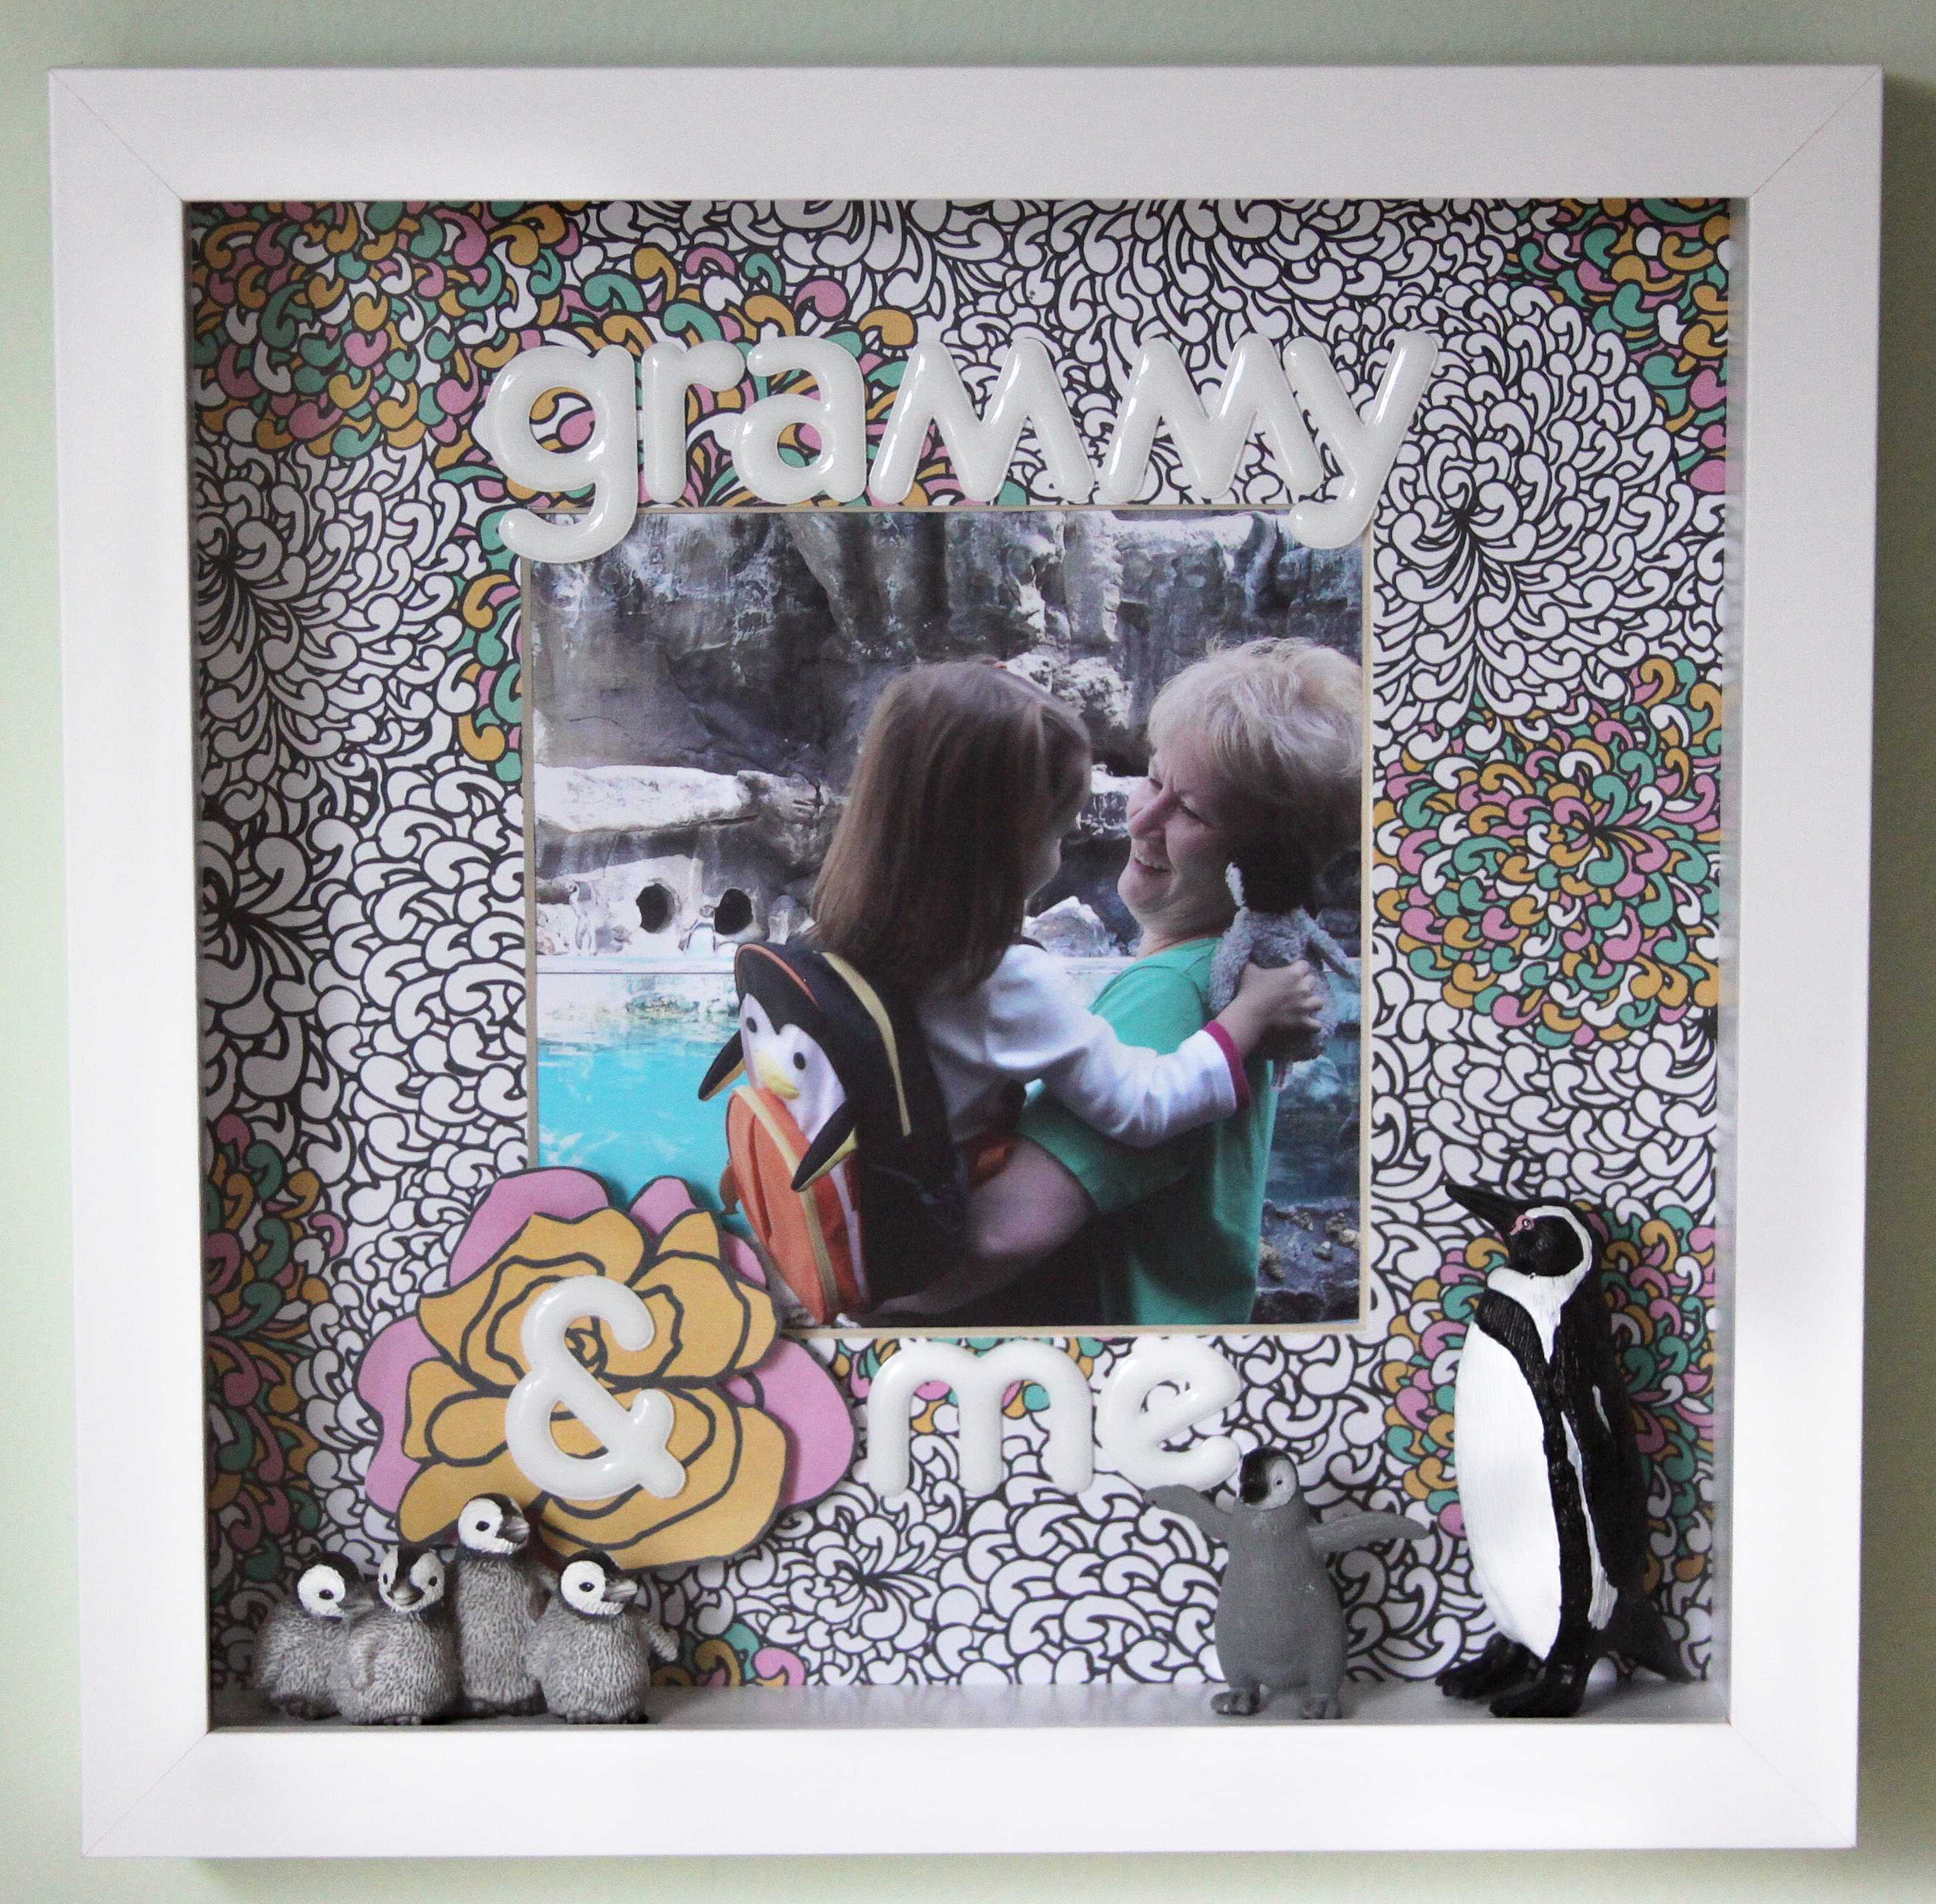 Grammy & Me Scrapbook Frame | Pretty PLZ